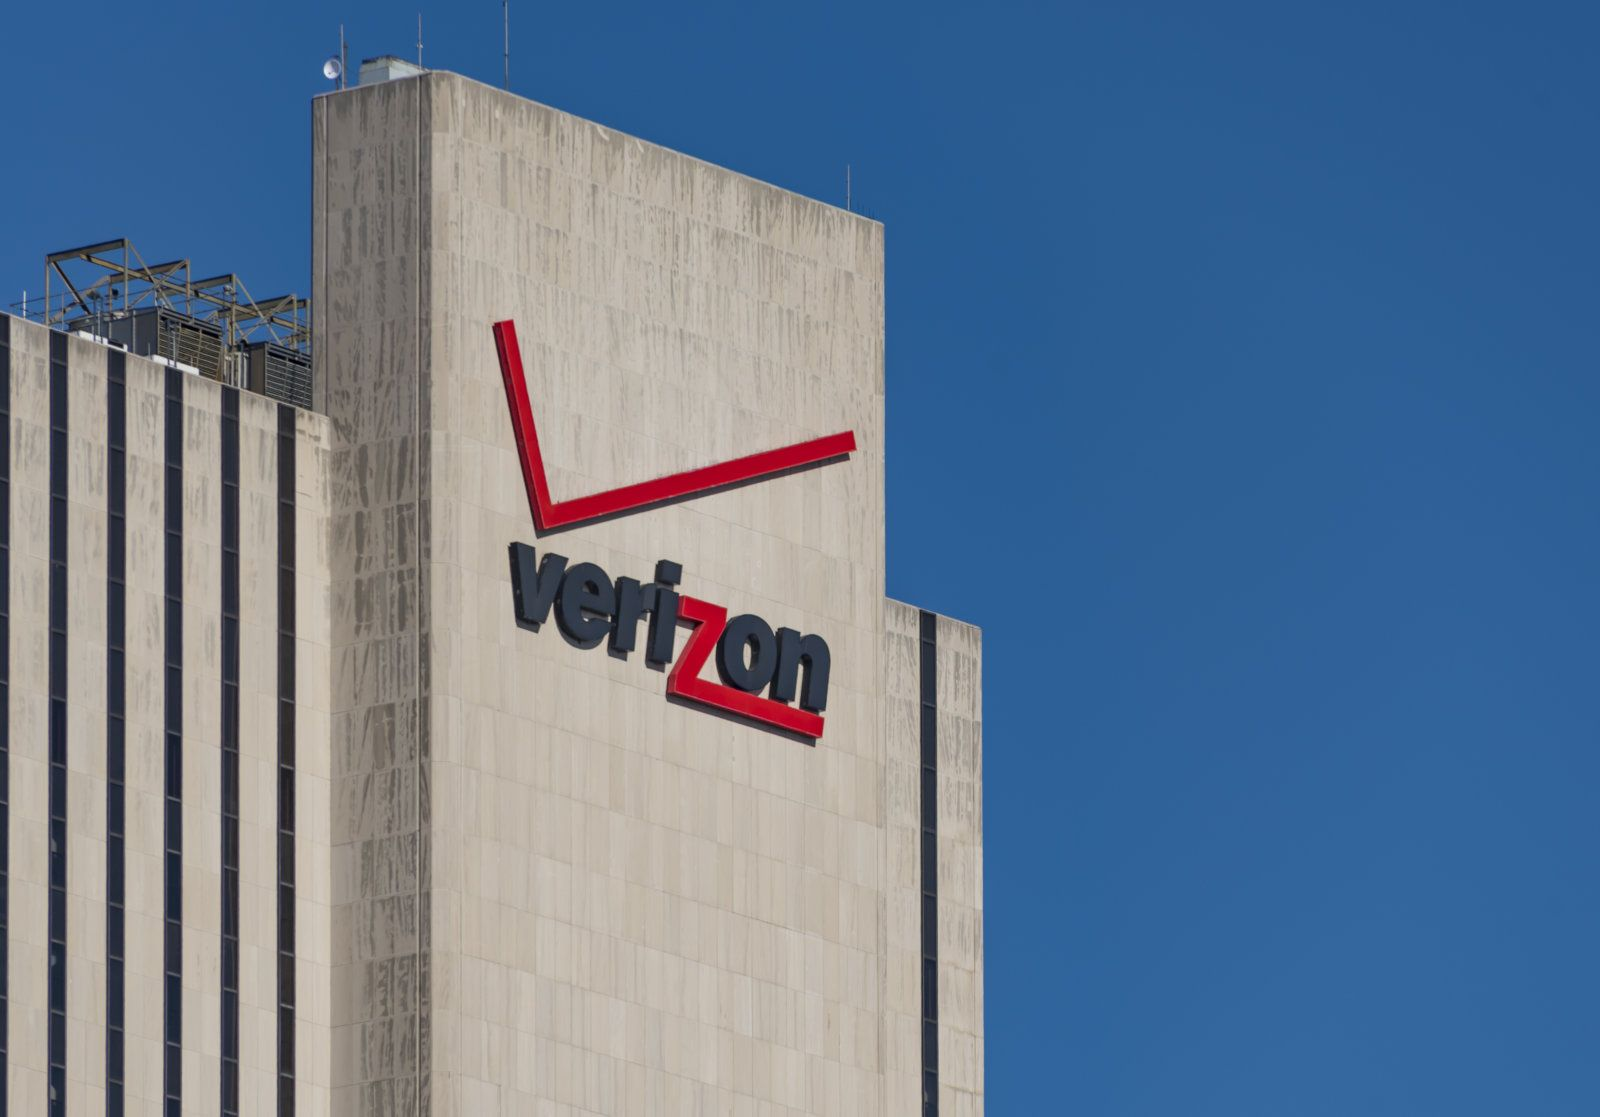 New York City sues Verizon over its fiber rollout